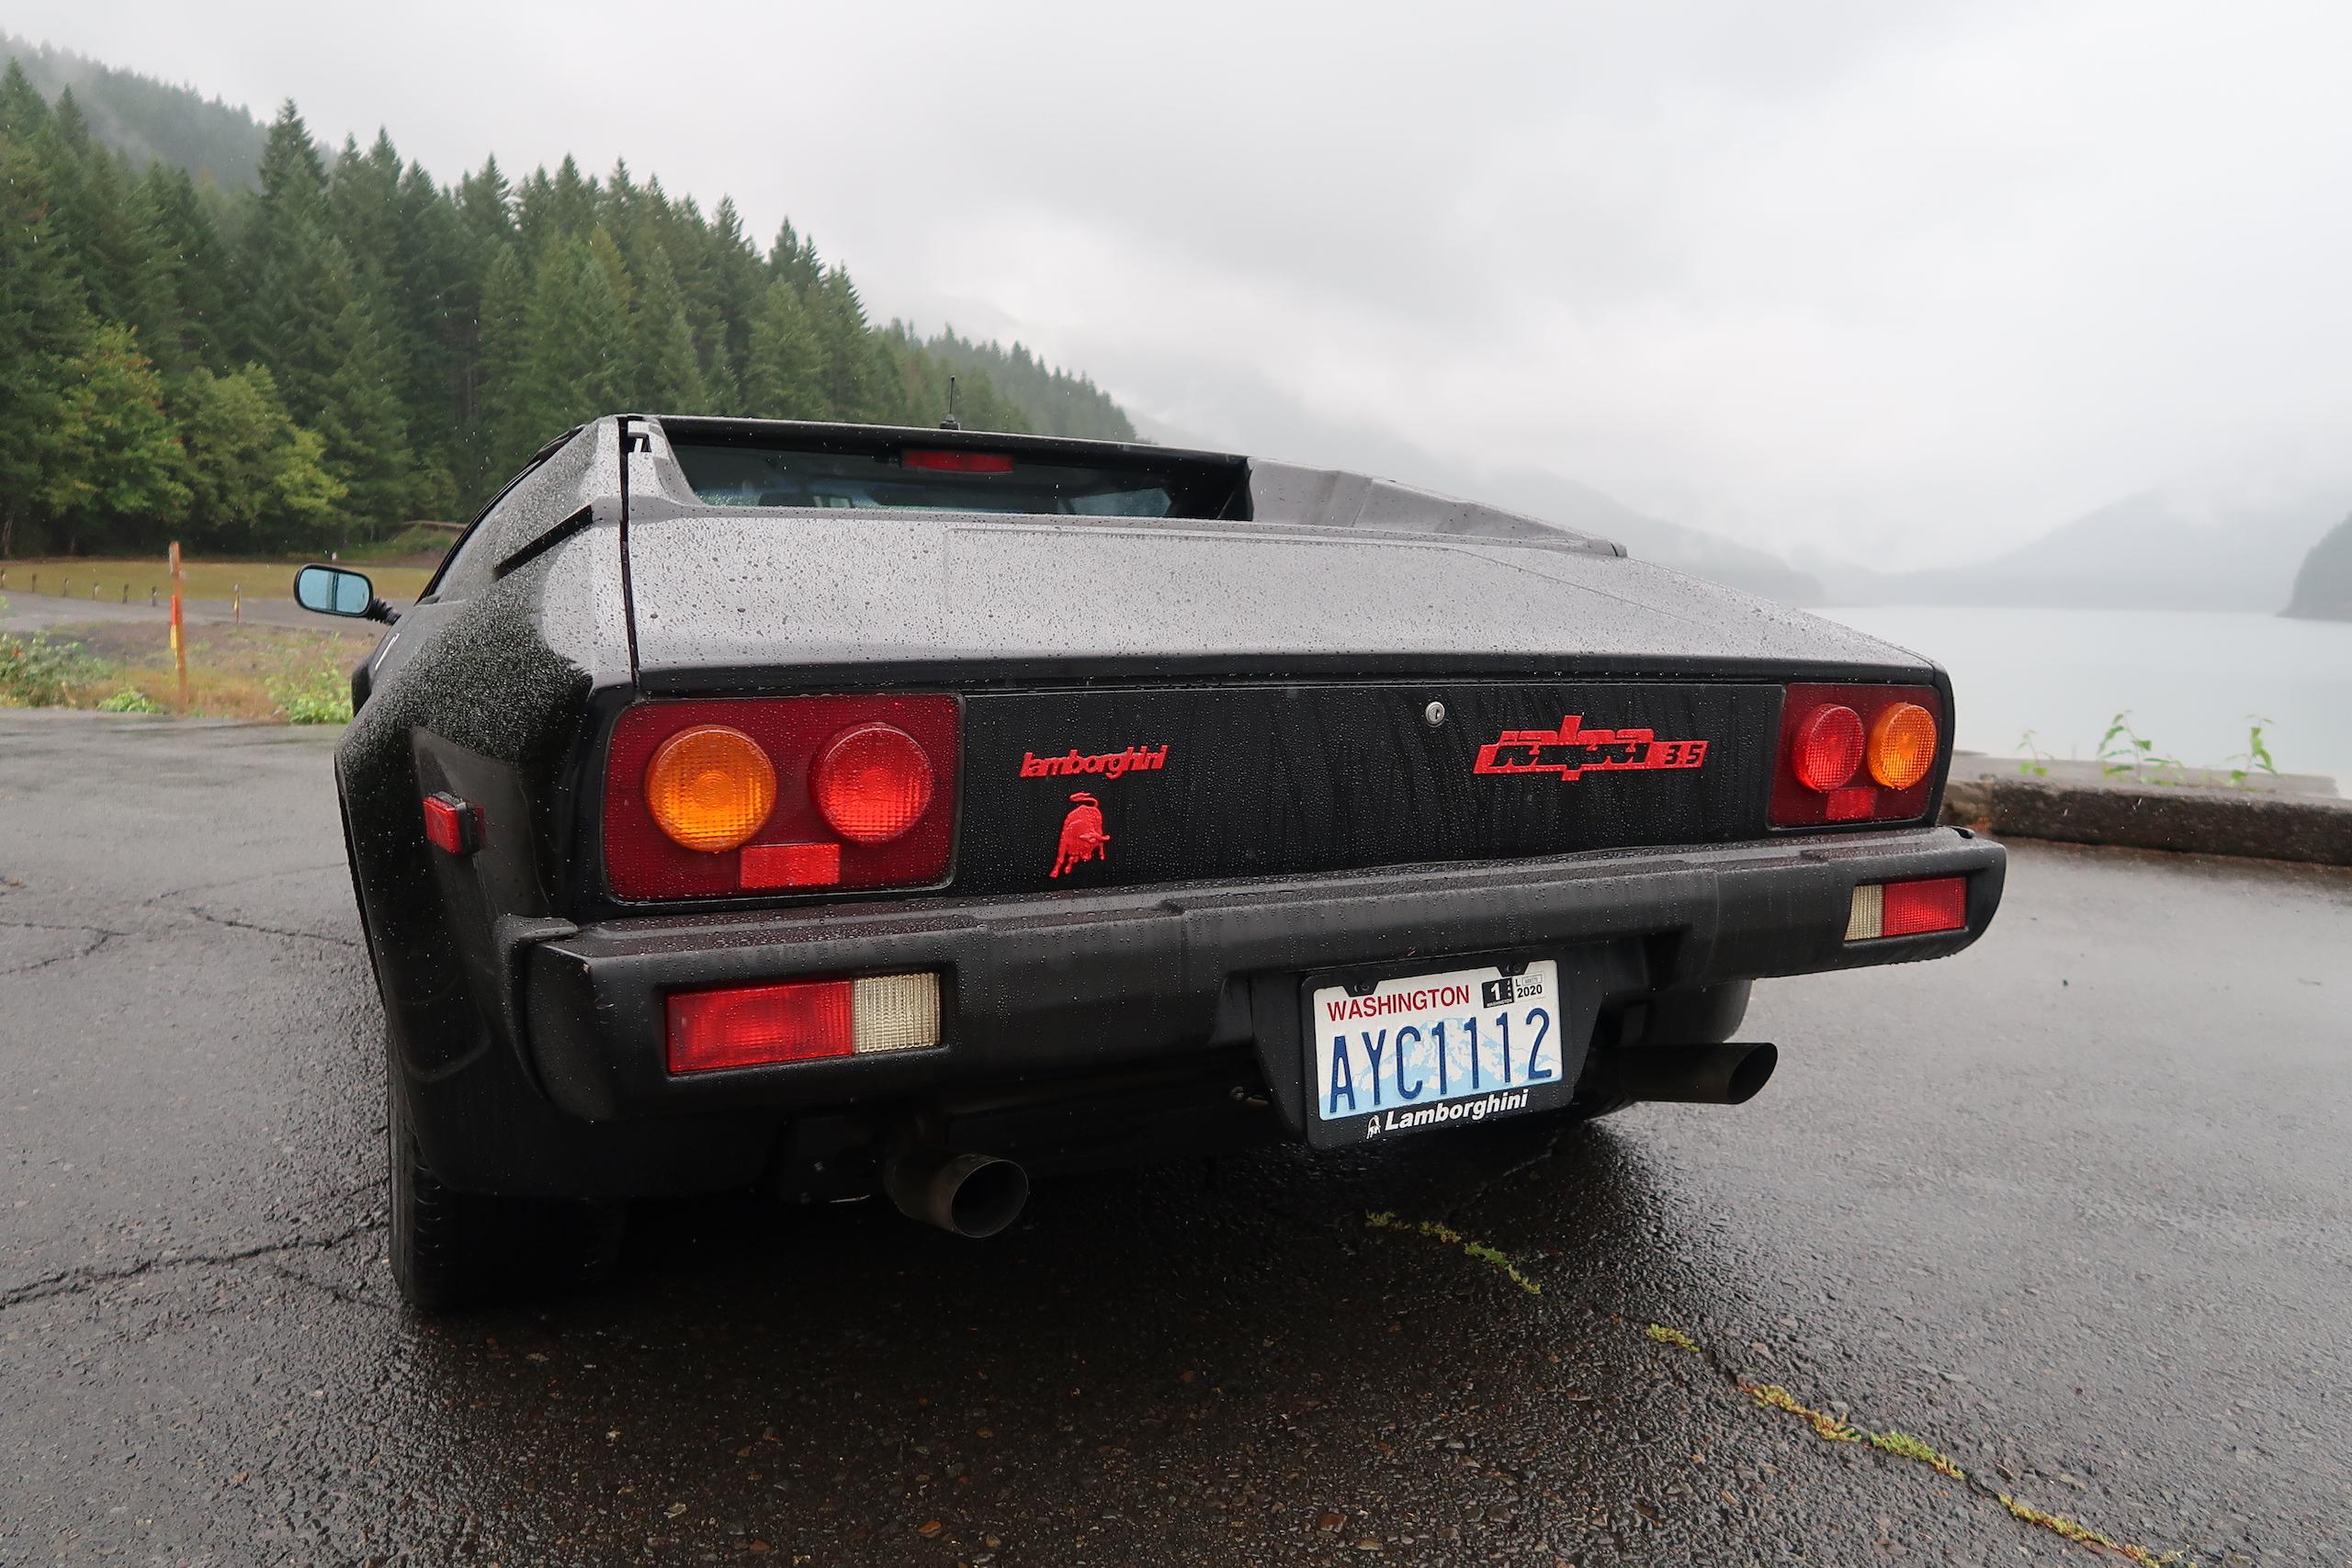 1986 Lamborghini Jalpa rear